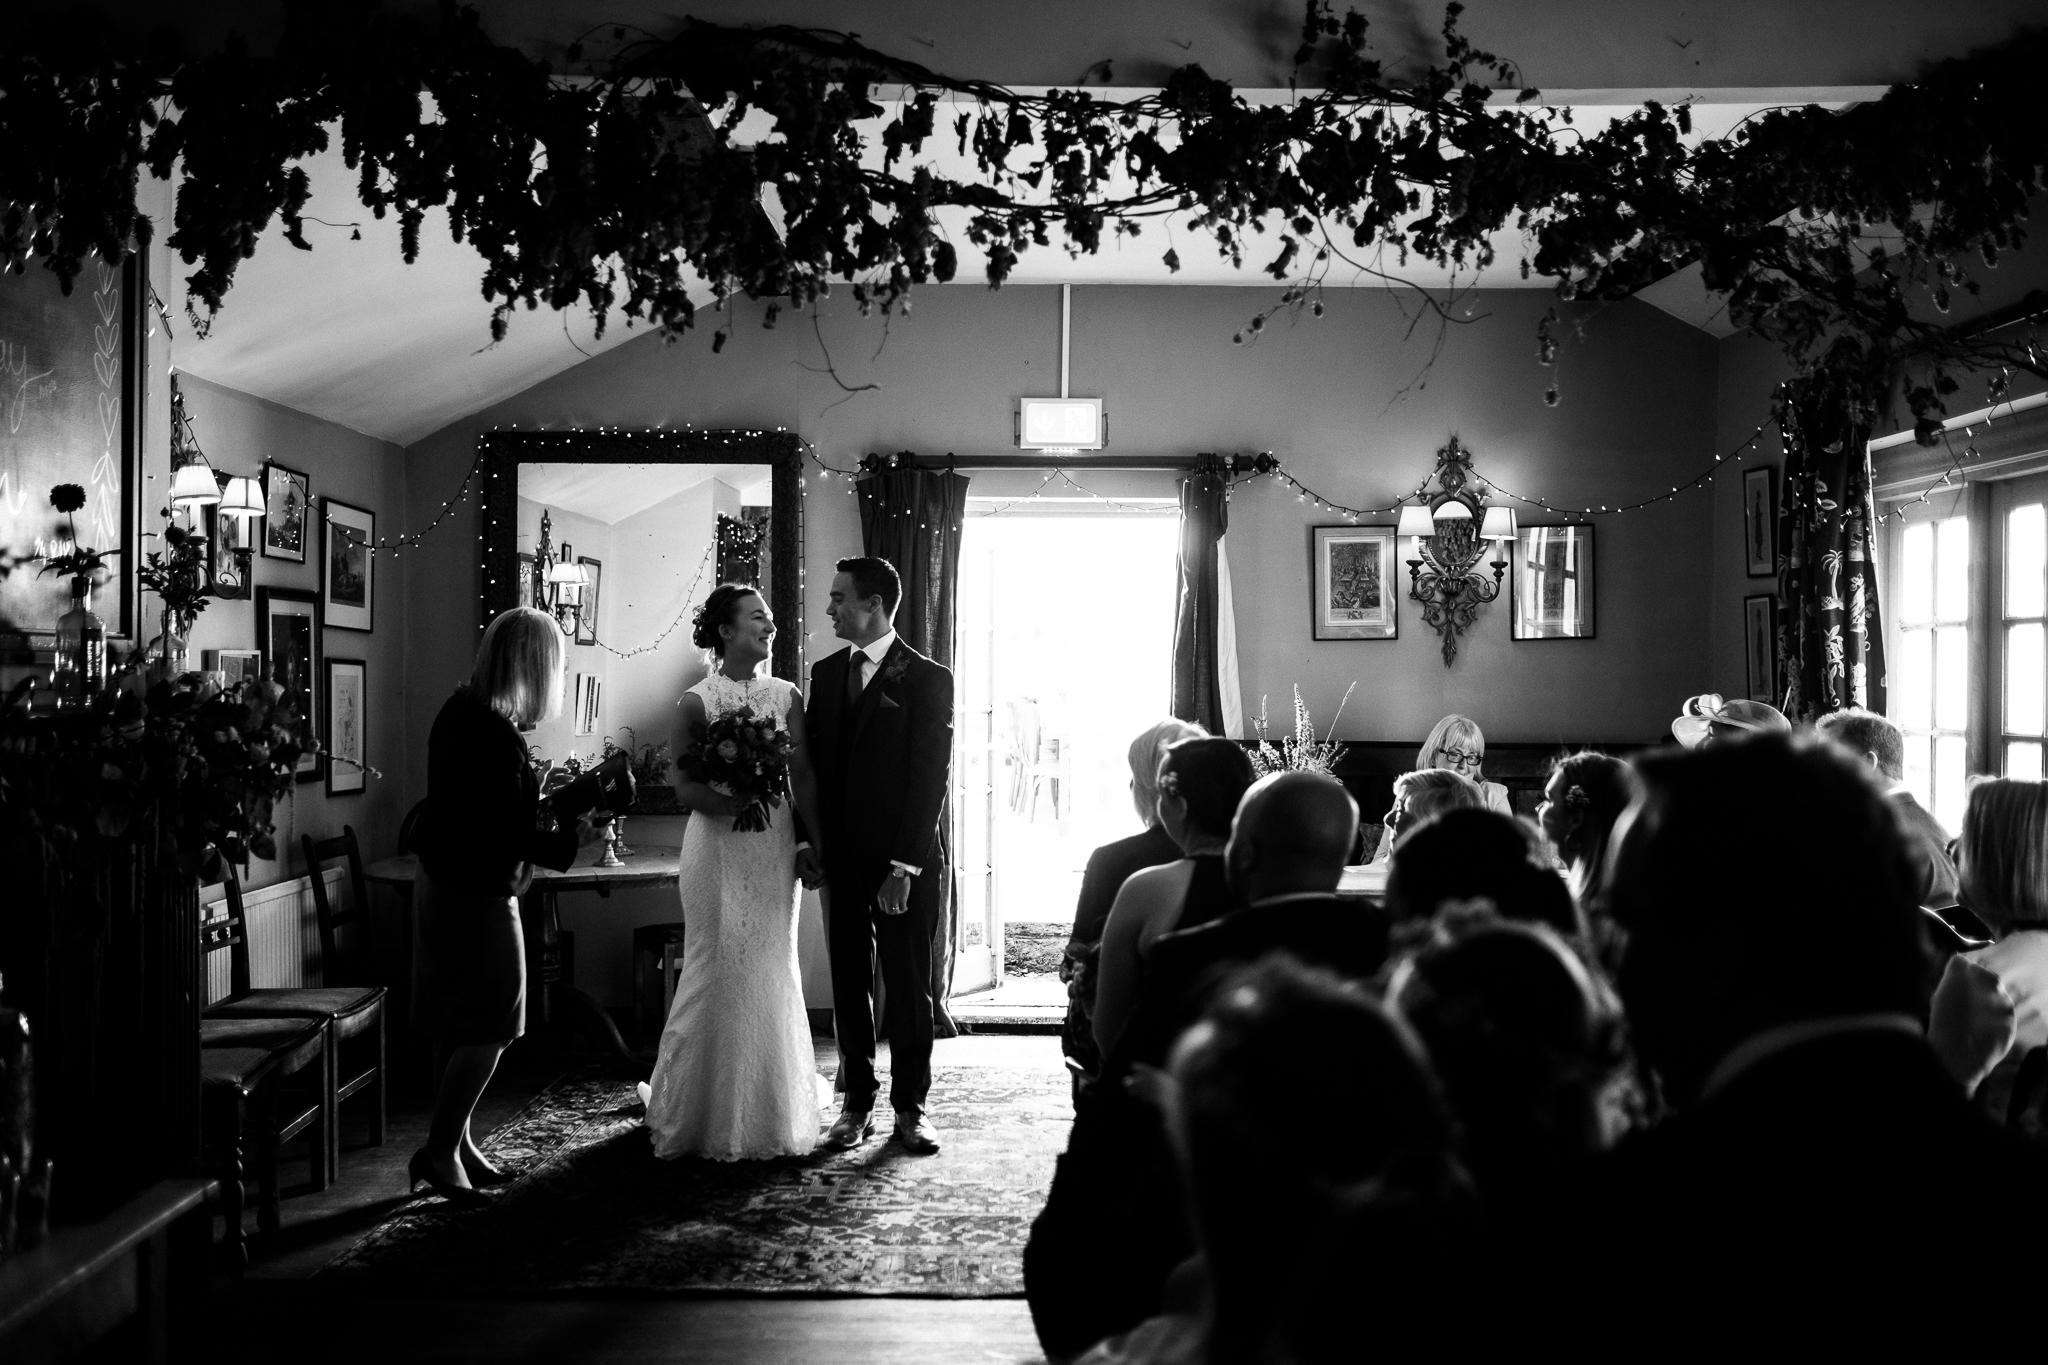 Relaxed Documentary Wedding Photography at The Wizard Inn, Alderley Edge Cheshire - Jenny Harper-35.jpg